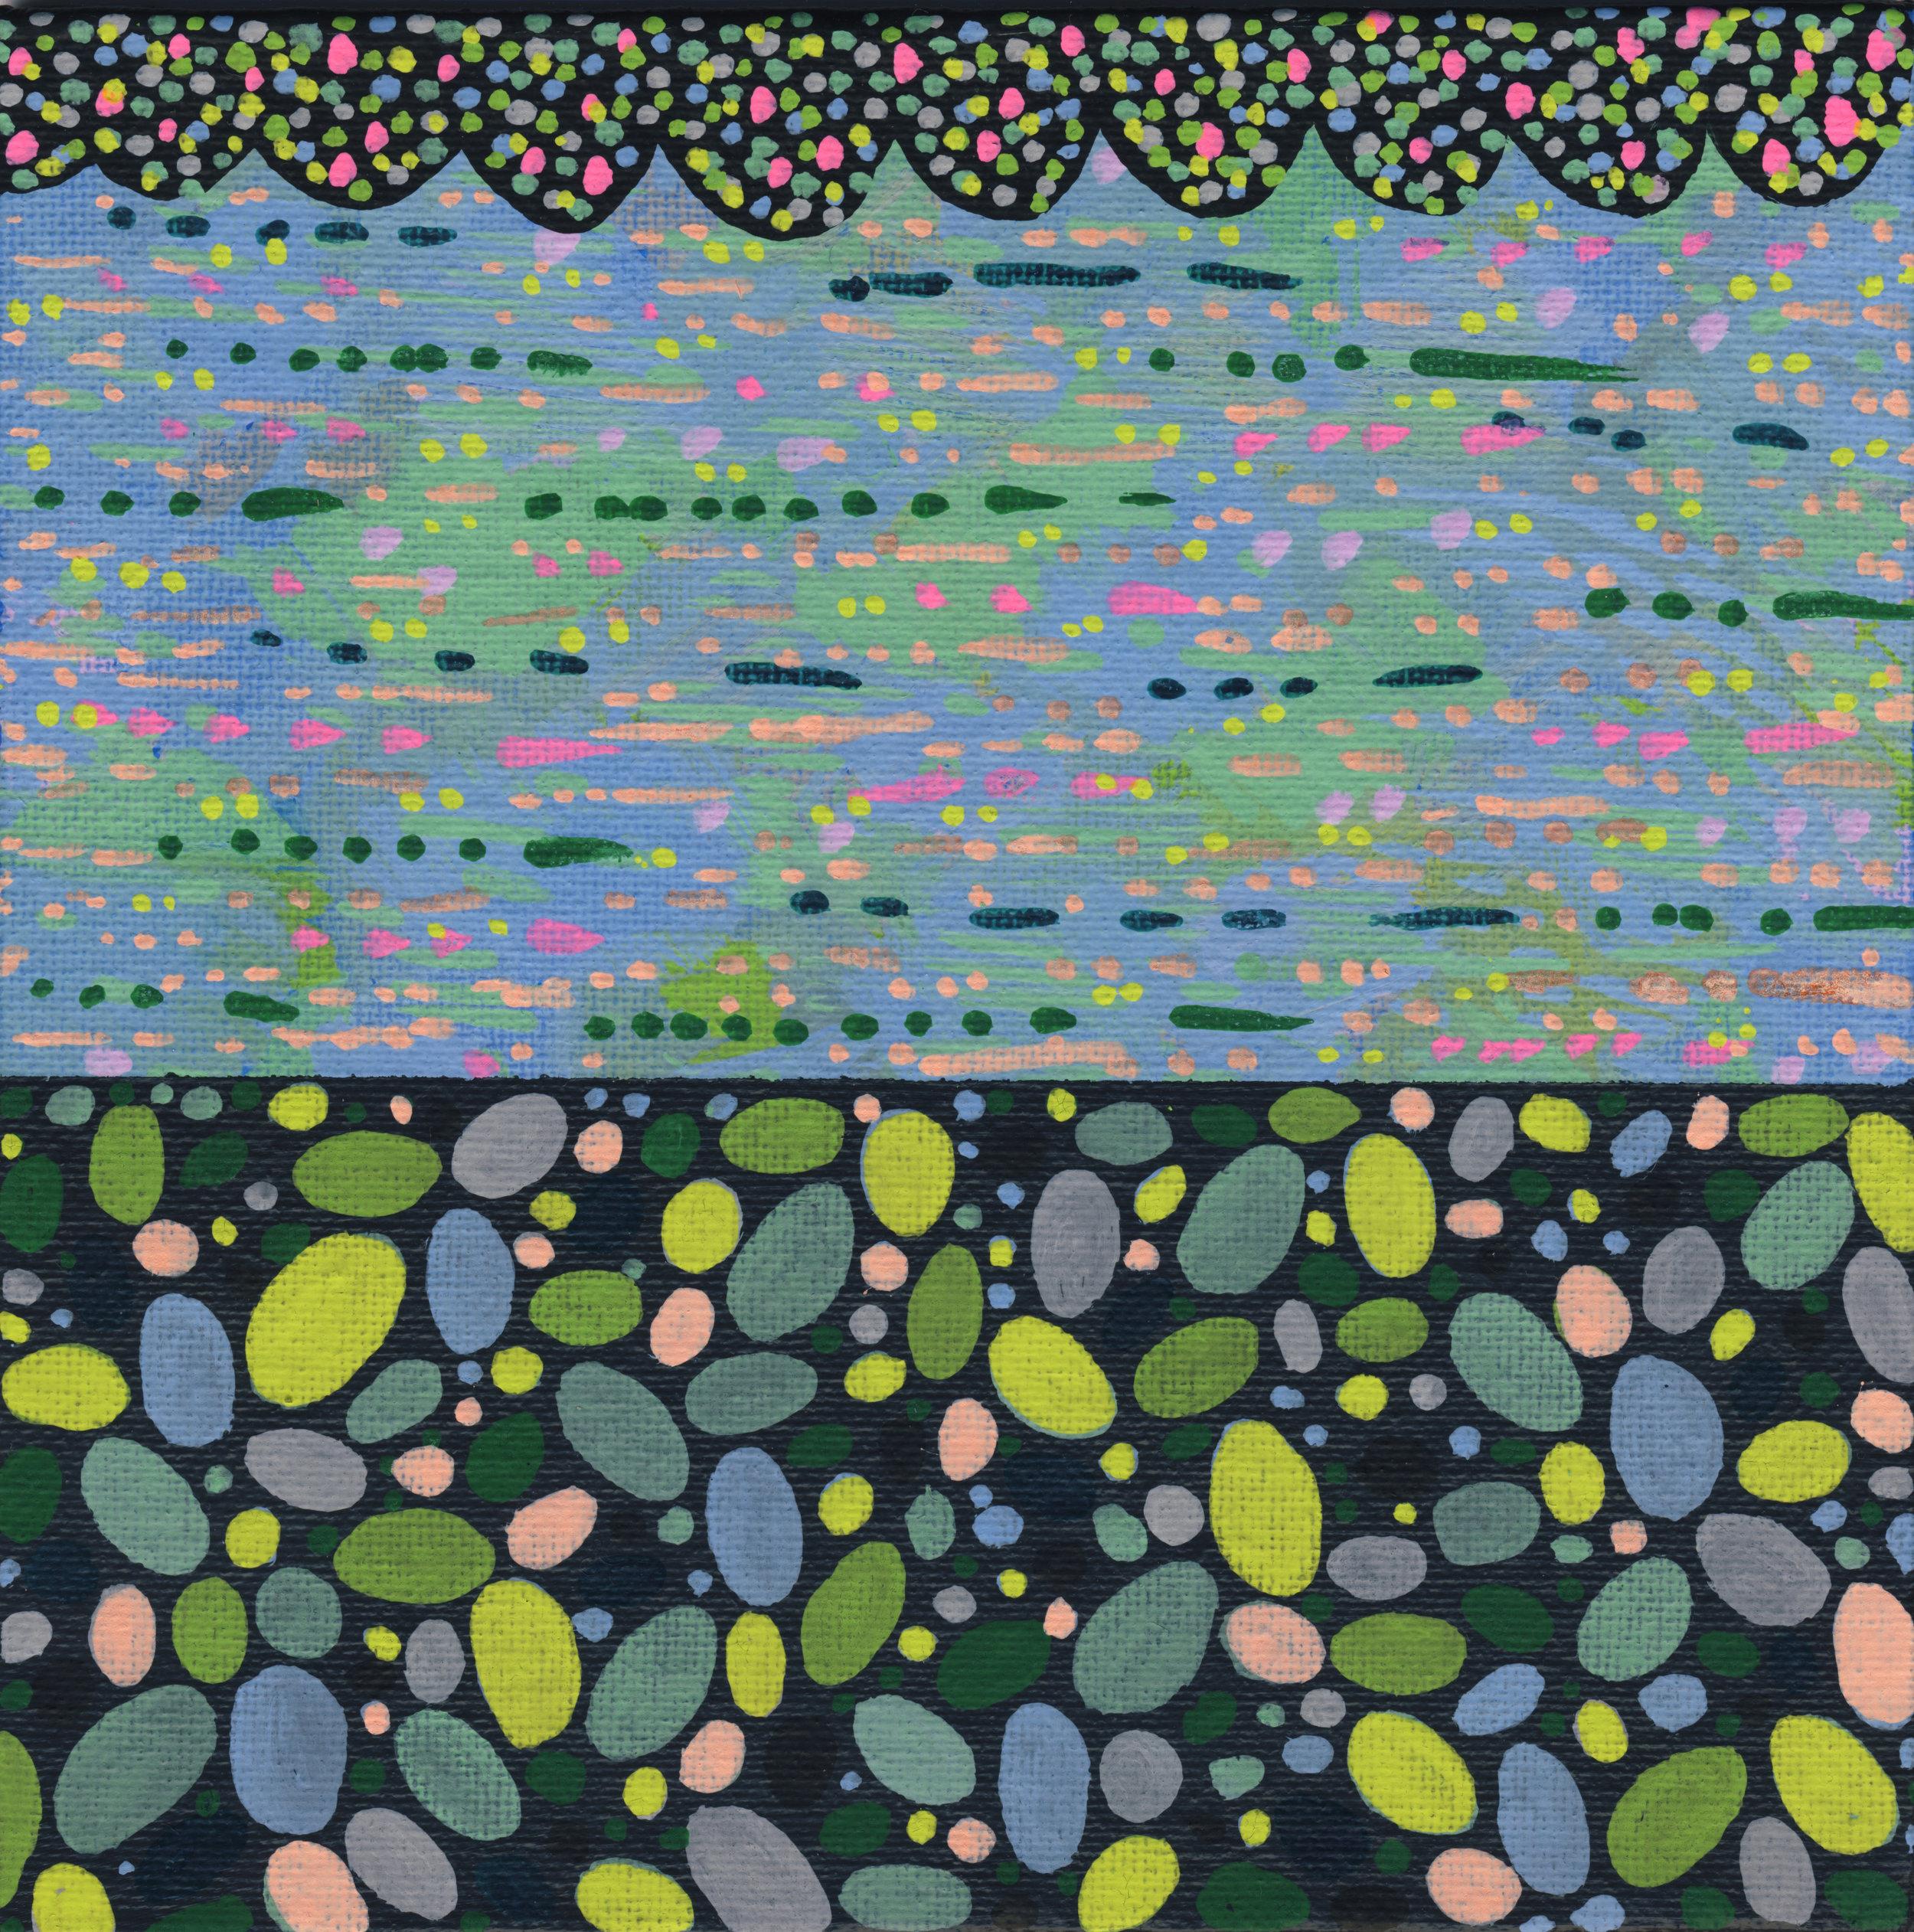 "55/100, Acrylic on canvas panel, 6"" X 6"", 3/2/19"